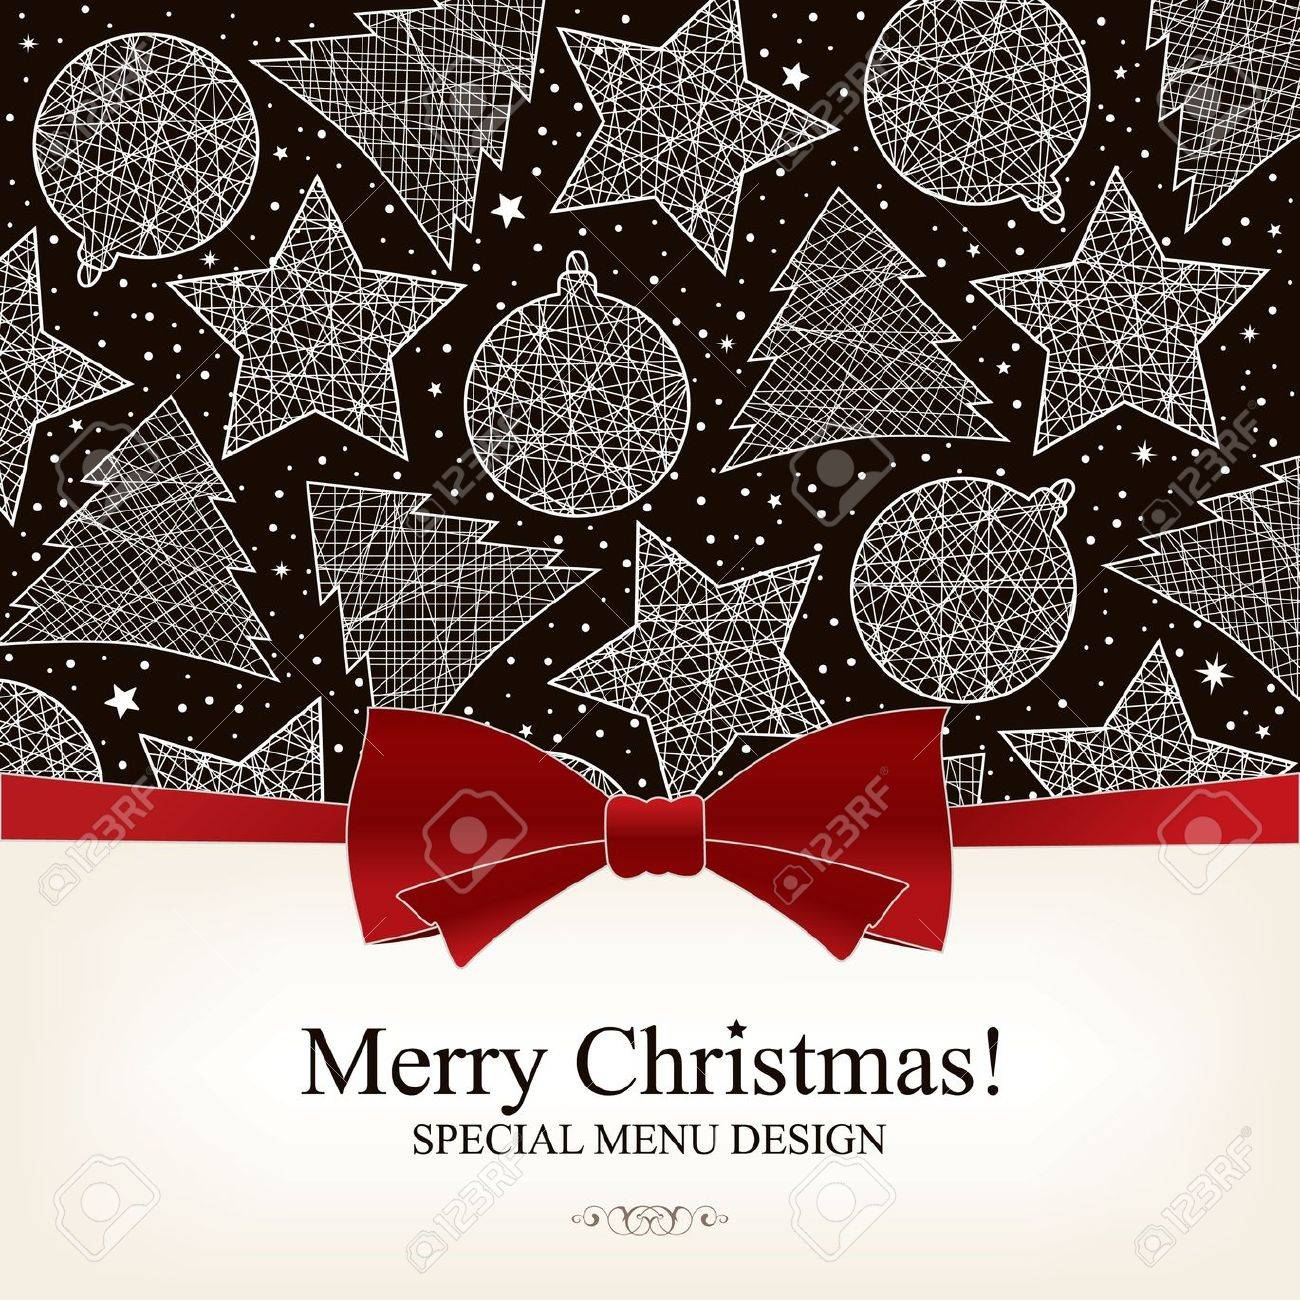 Vector. Special Christmas menu design Stock Vector - 10940317